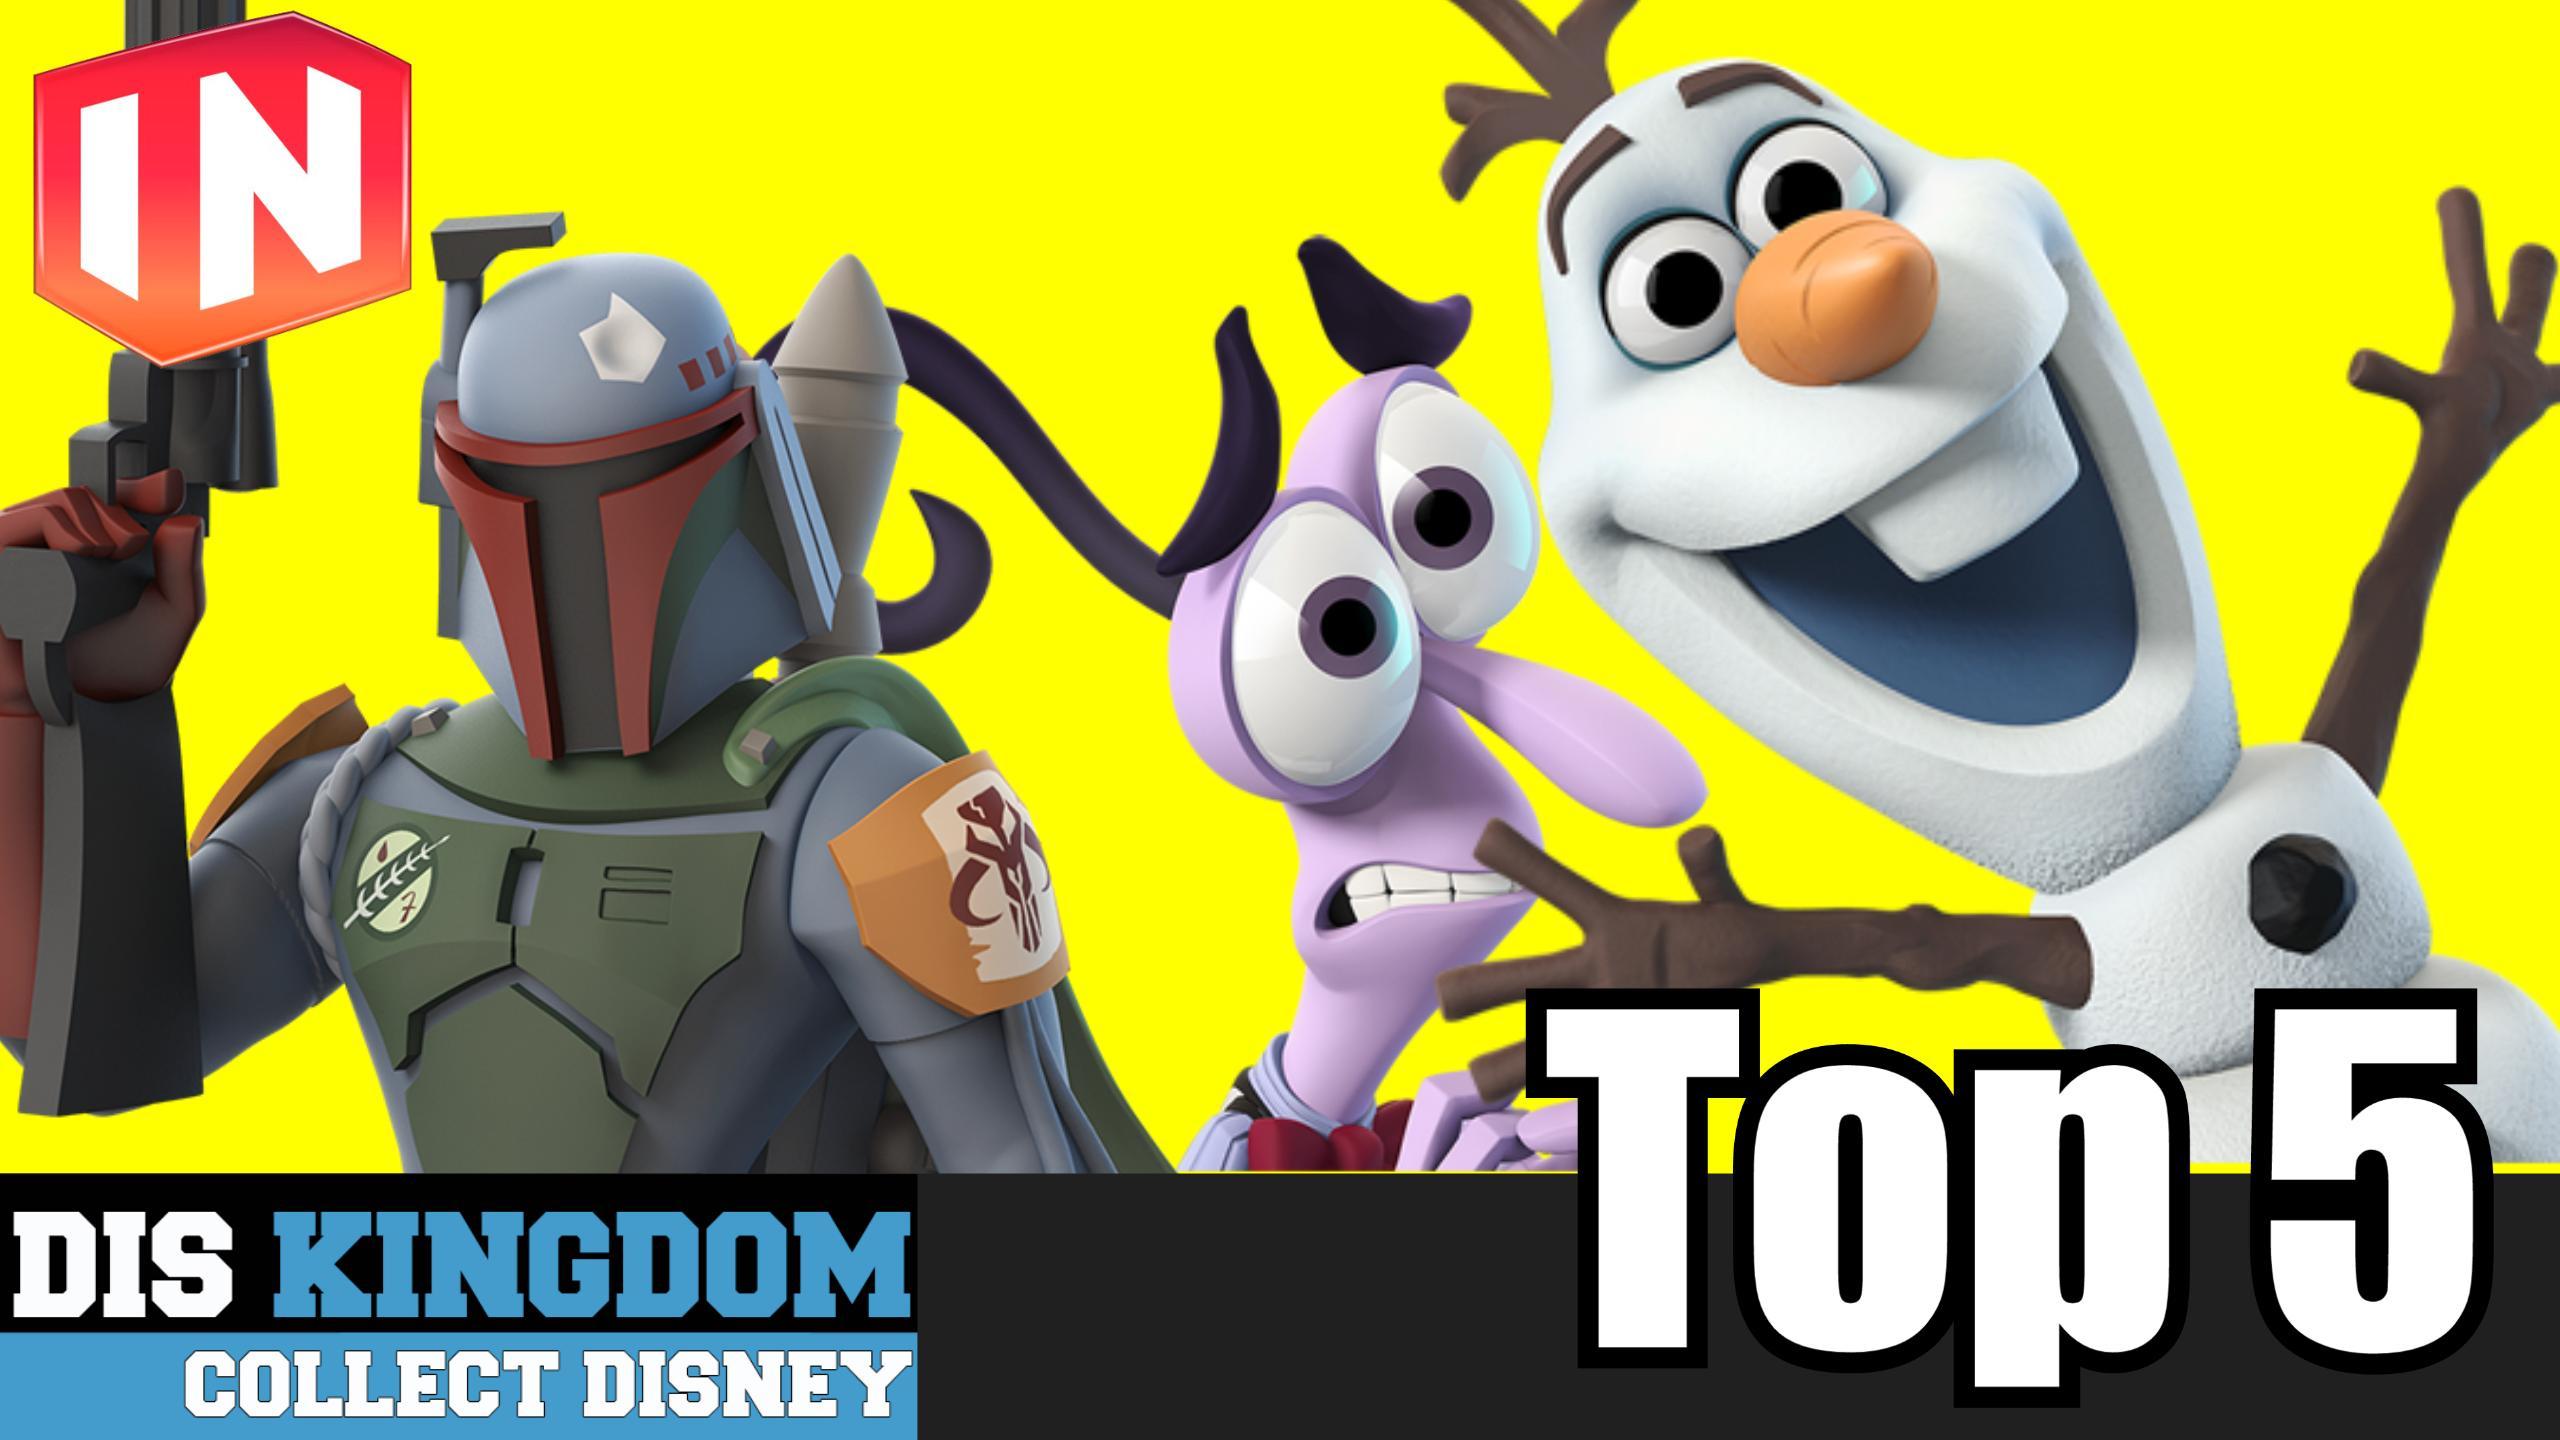 My Top 5 Disney Infinity 3.0 Characters